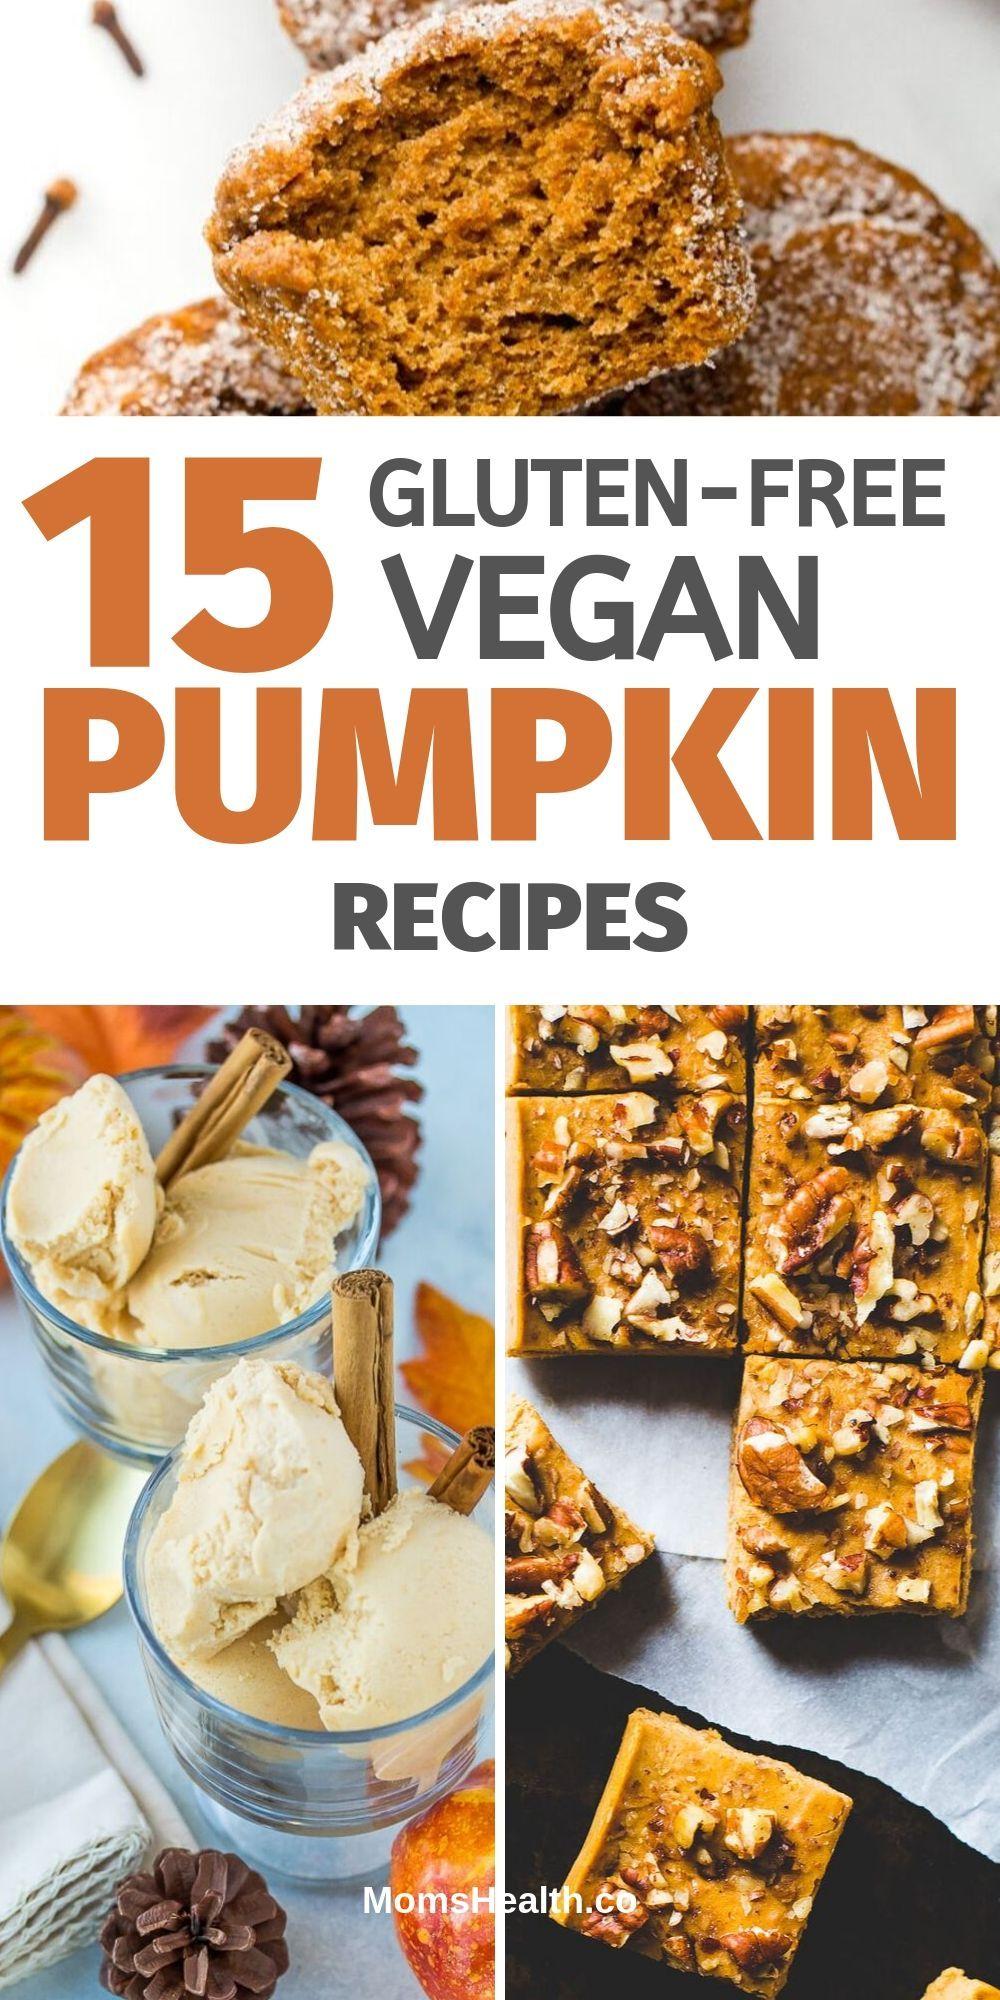 15 Best Vegan Gluten Free Pumpkin Recipes To Try This Fall Gluten Free Pumpkin Recipes Pumpkin Recipes Vegan Pumpkin